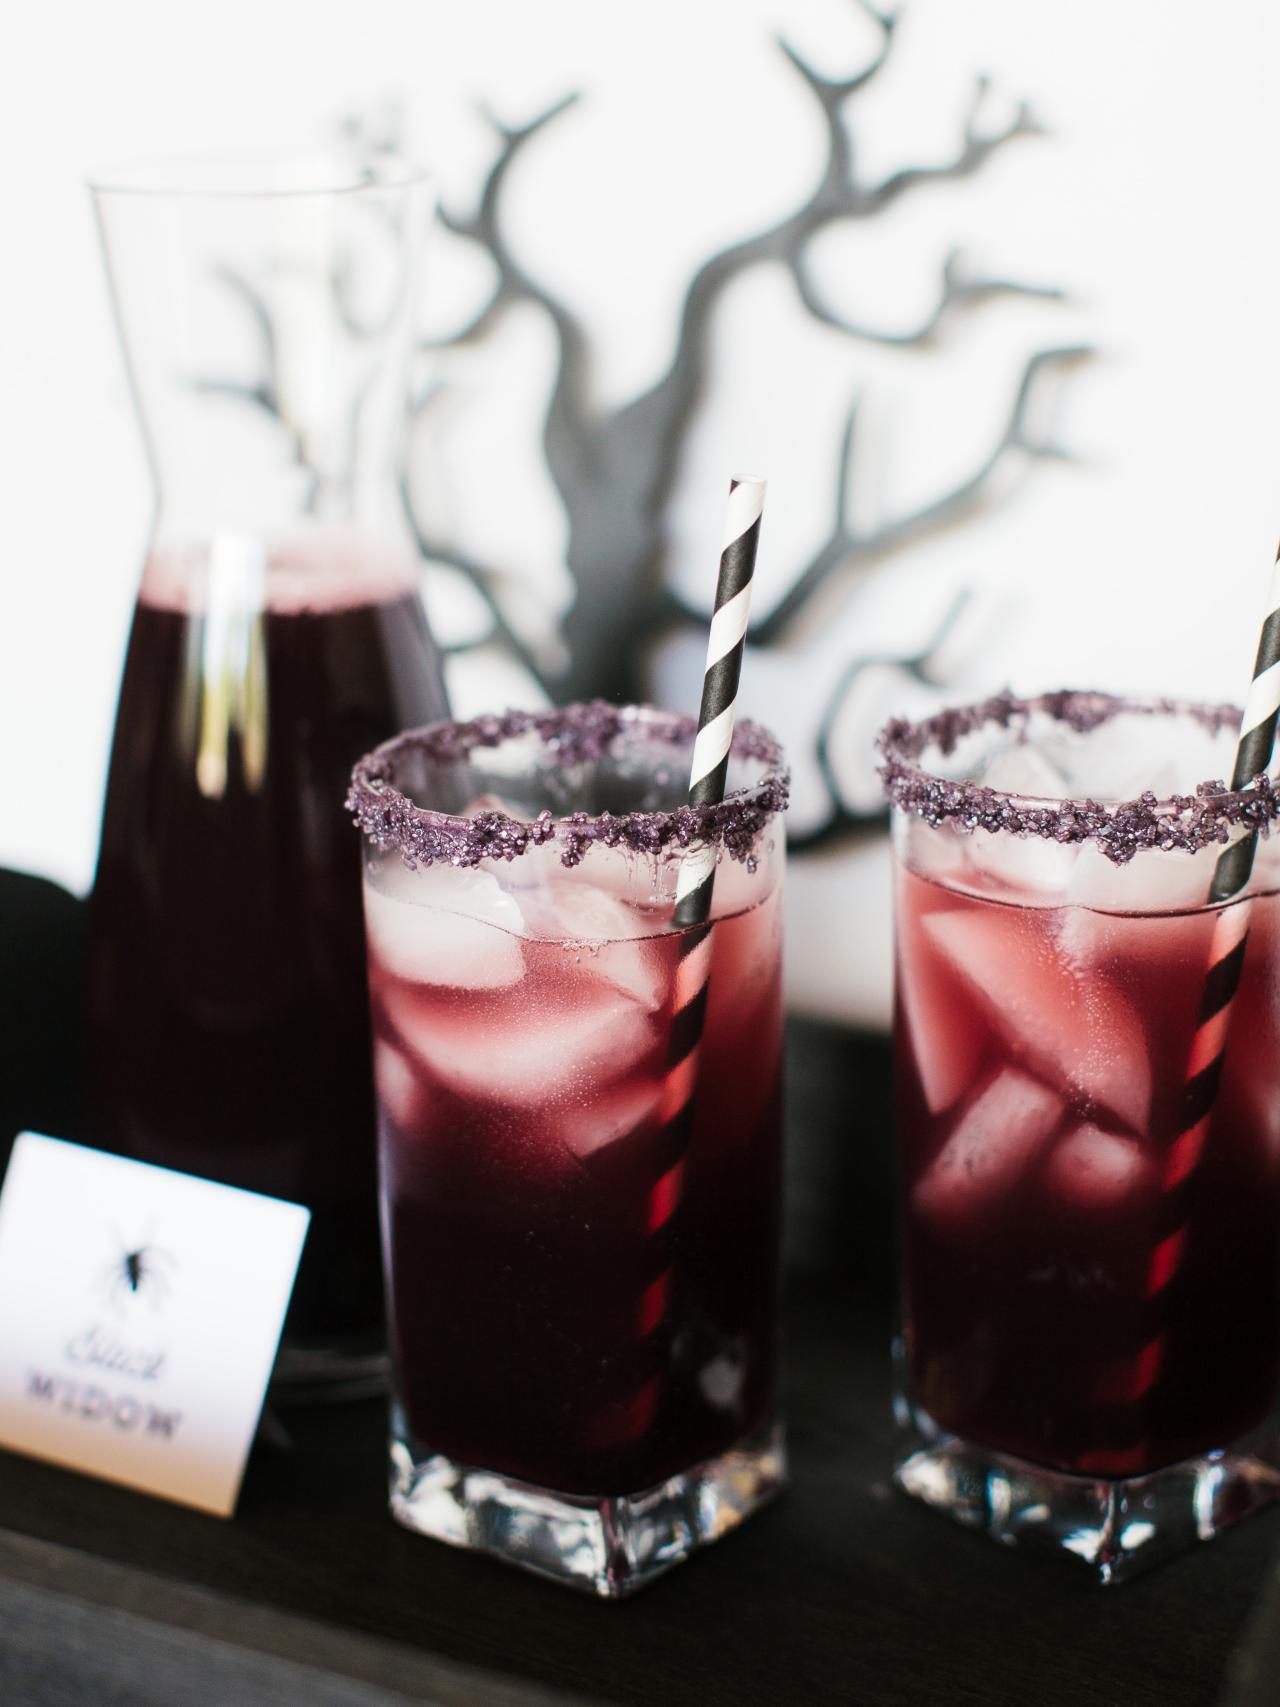 Easy Halloween Drinks Alcohol  Pinterest Picks 8 Eerie Halloween Cocktails